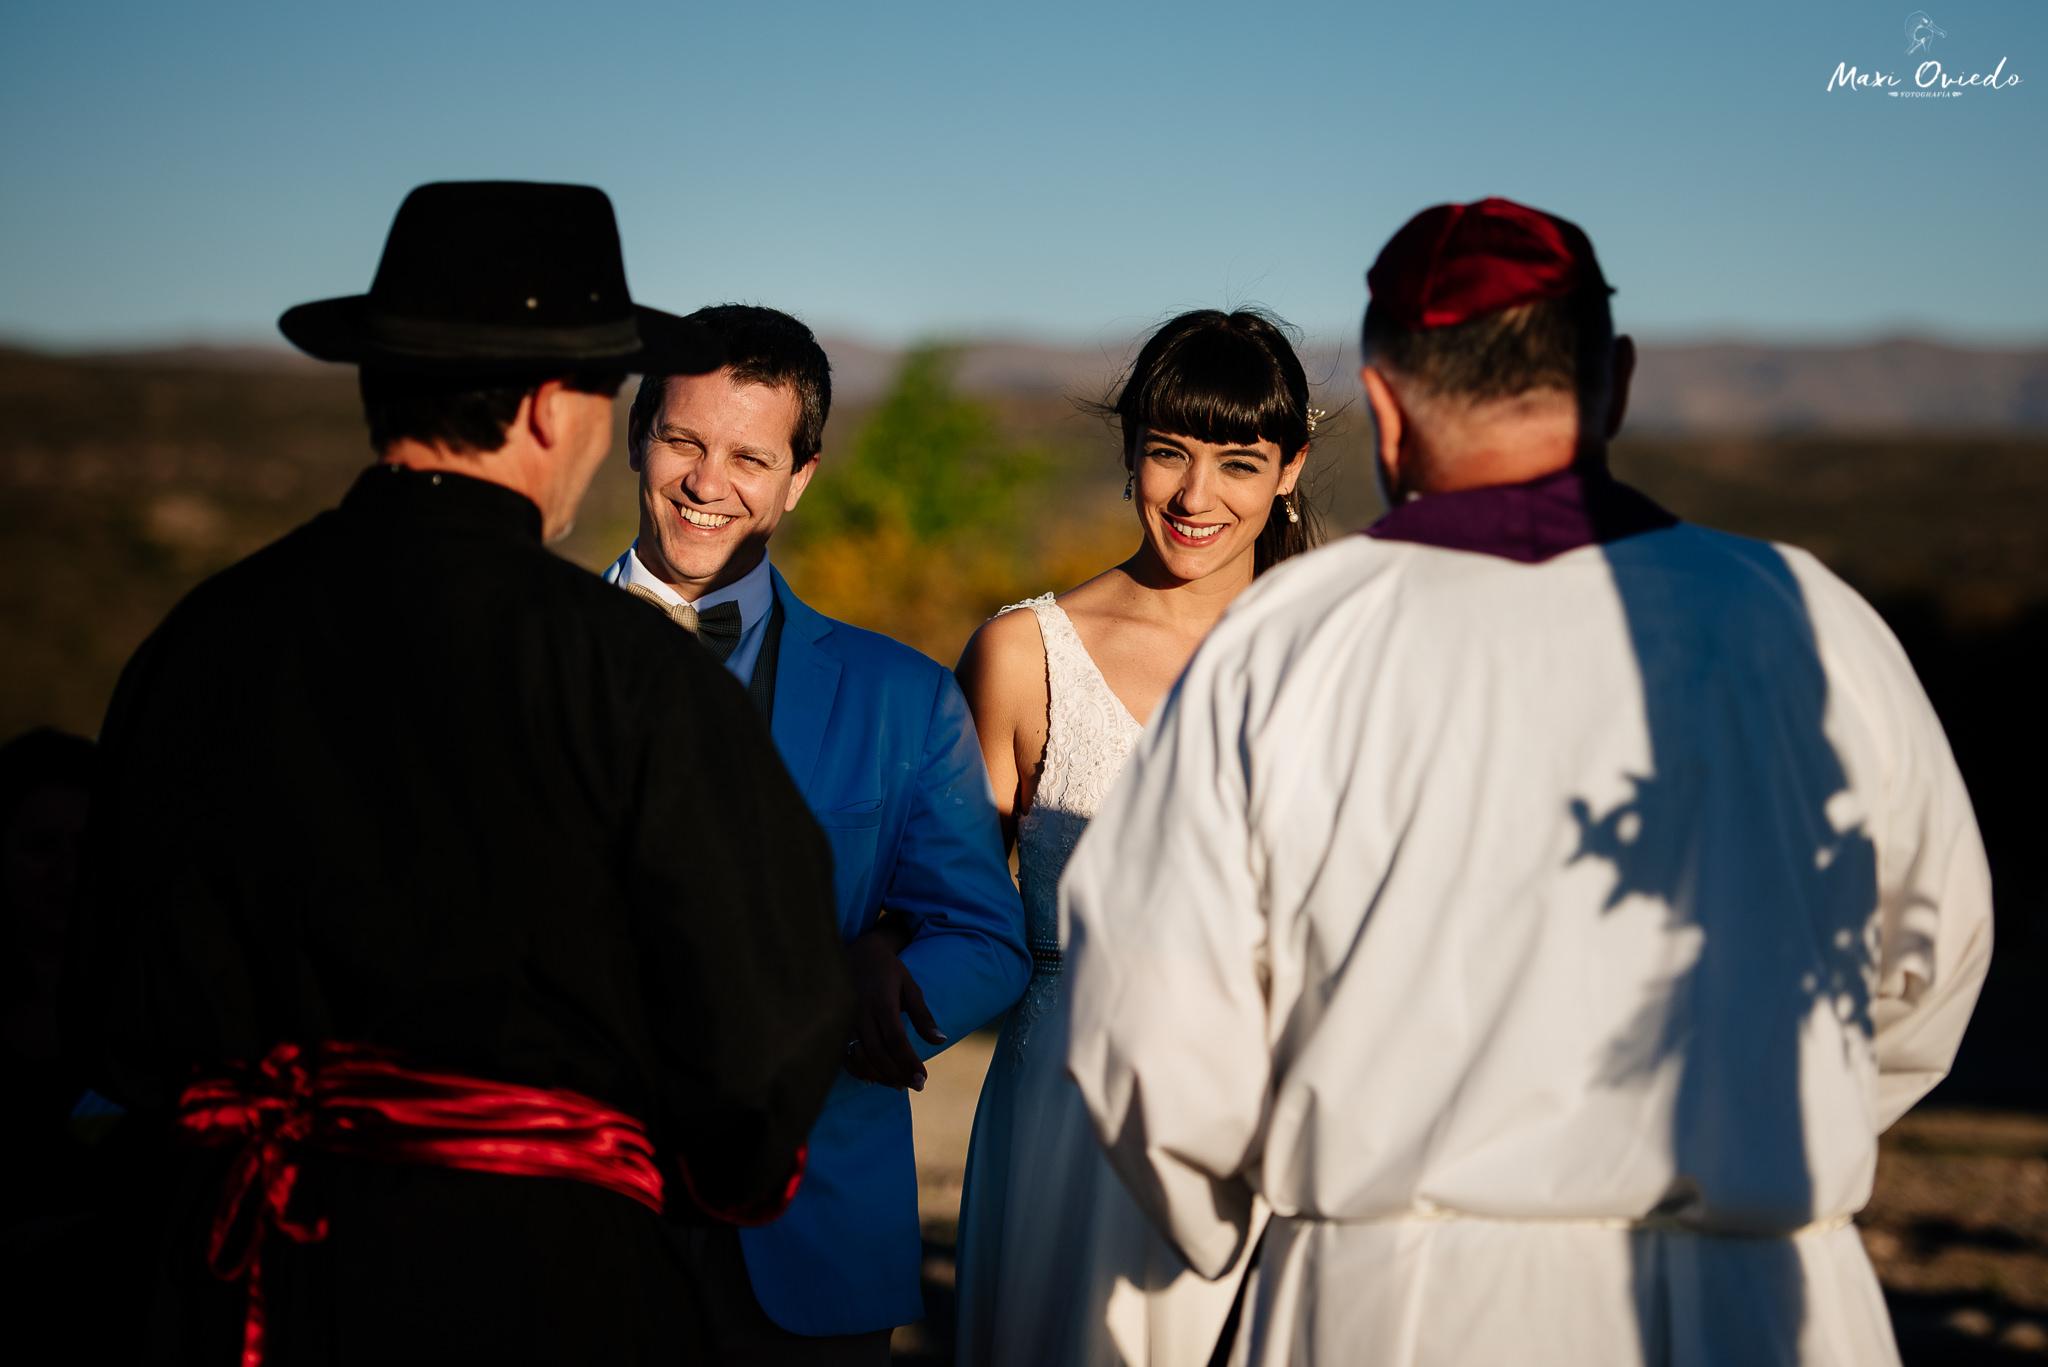 boda sextuple la cumbre cordoba cuchi corral fotografo de bodas fotografo de casamientos rosario san nicolas argentina vestido de novia ramo de novia-24.jpg